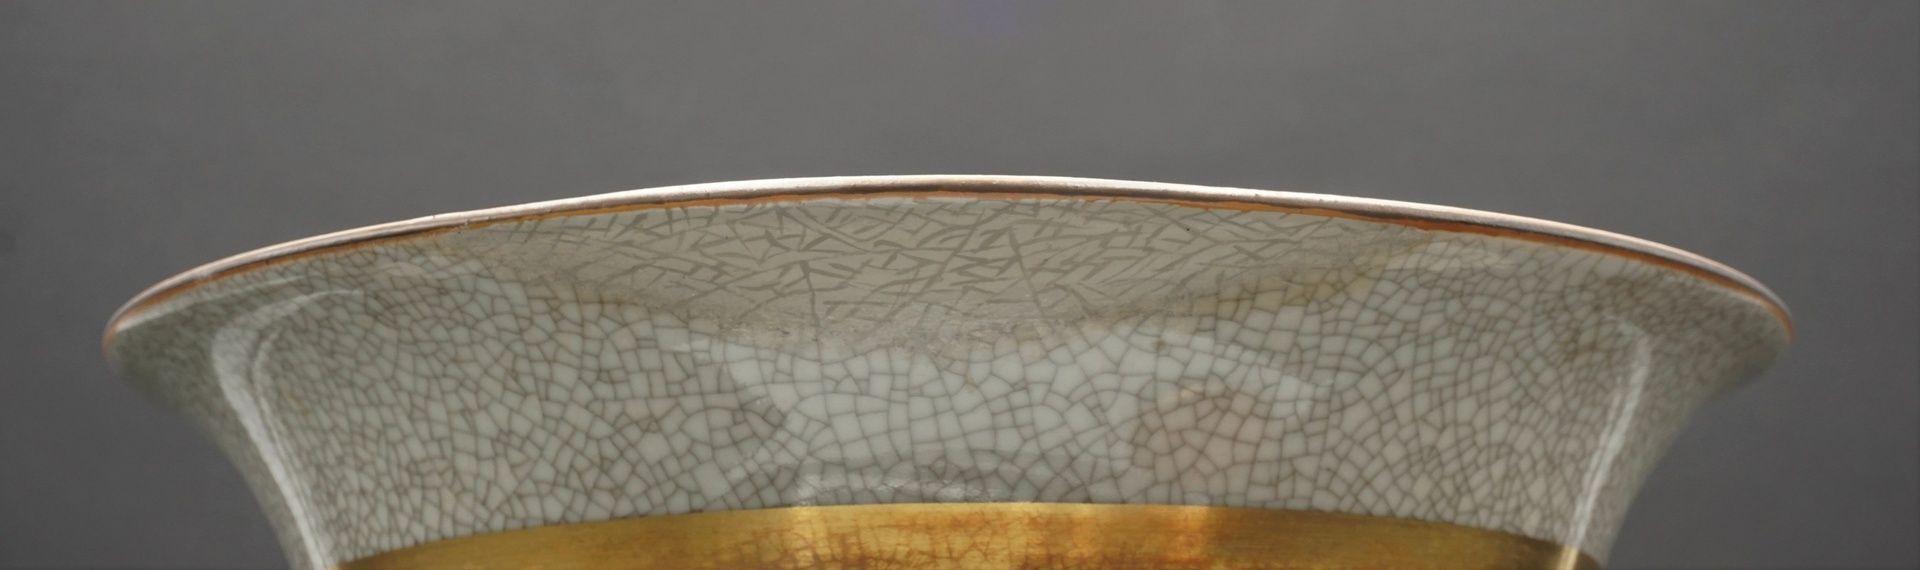 Royal Copenhagen große Krakelee Vase mit Schale, um 1950 - Bild 5 aus 8